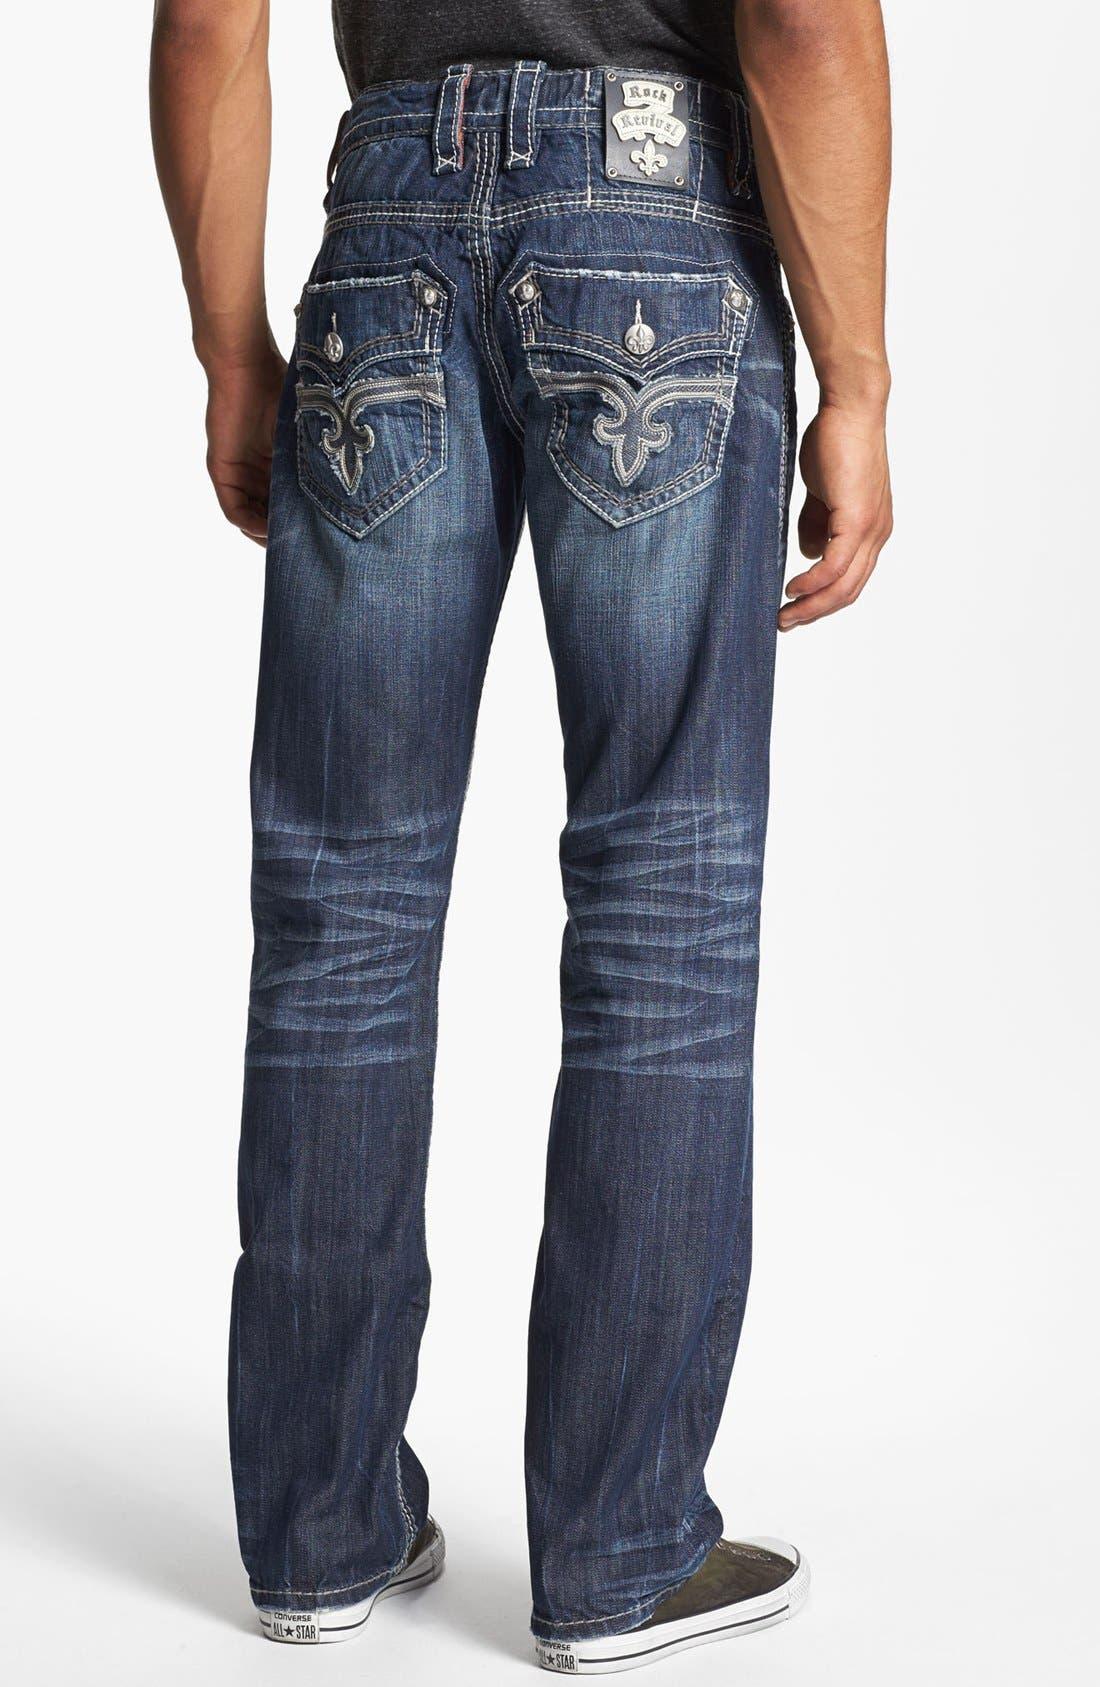 Alternate Image 1 Selected - Rock Revival 'Dan' Straight Leg Jeans (Dark Blue)